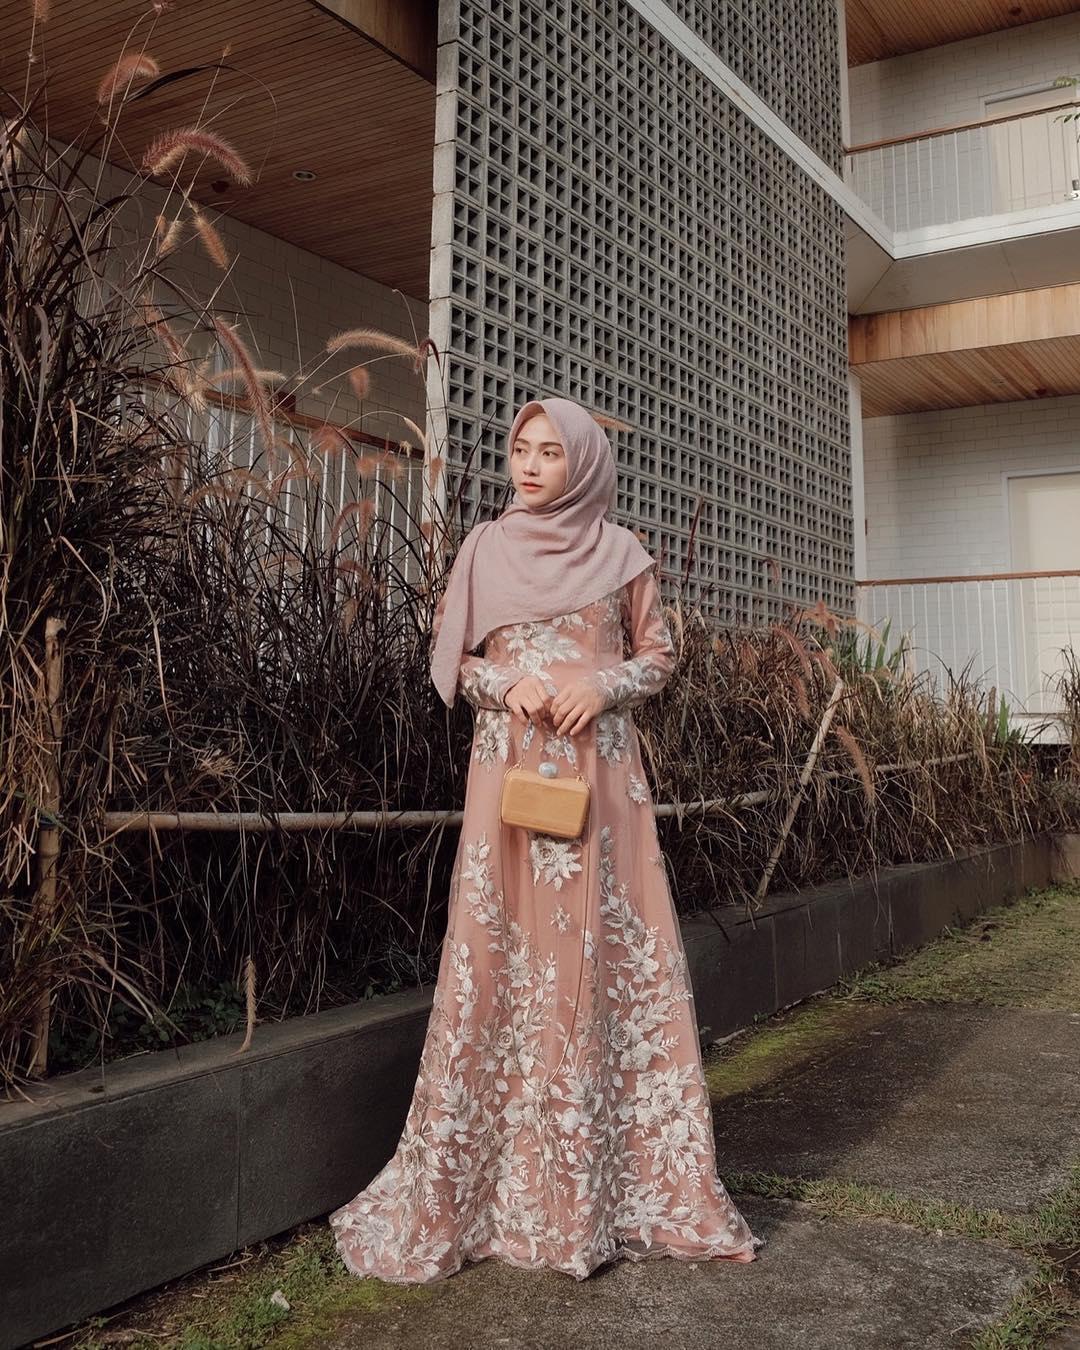 Model Baju Lebaran 2019 AnggunModel Baju Lebaran 2019 Anggun